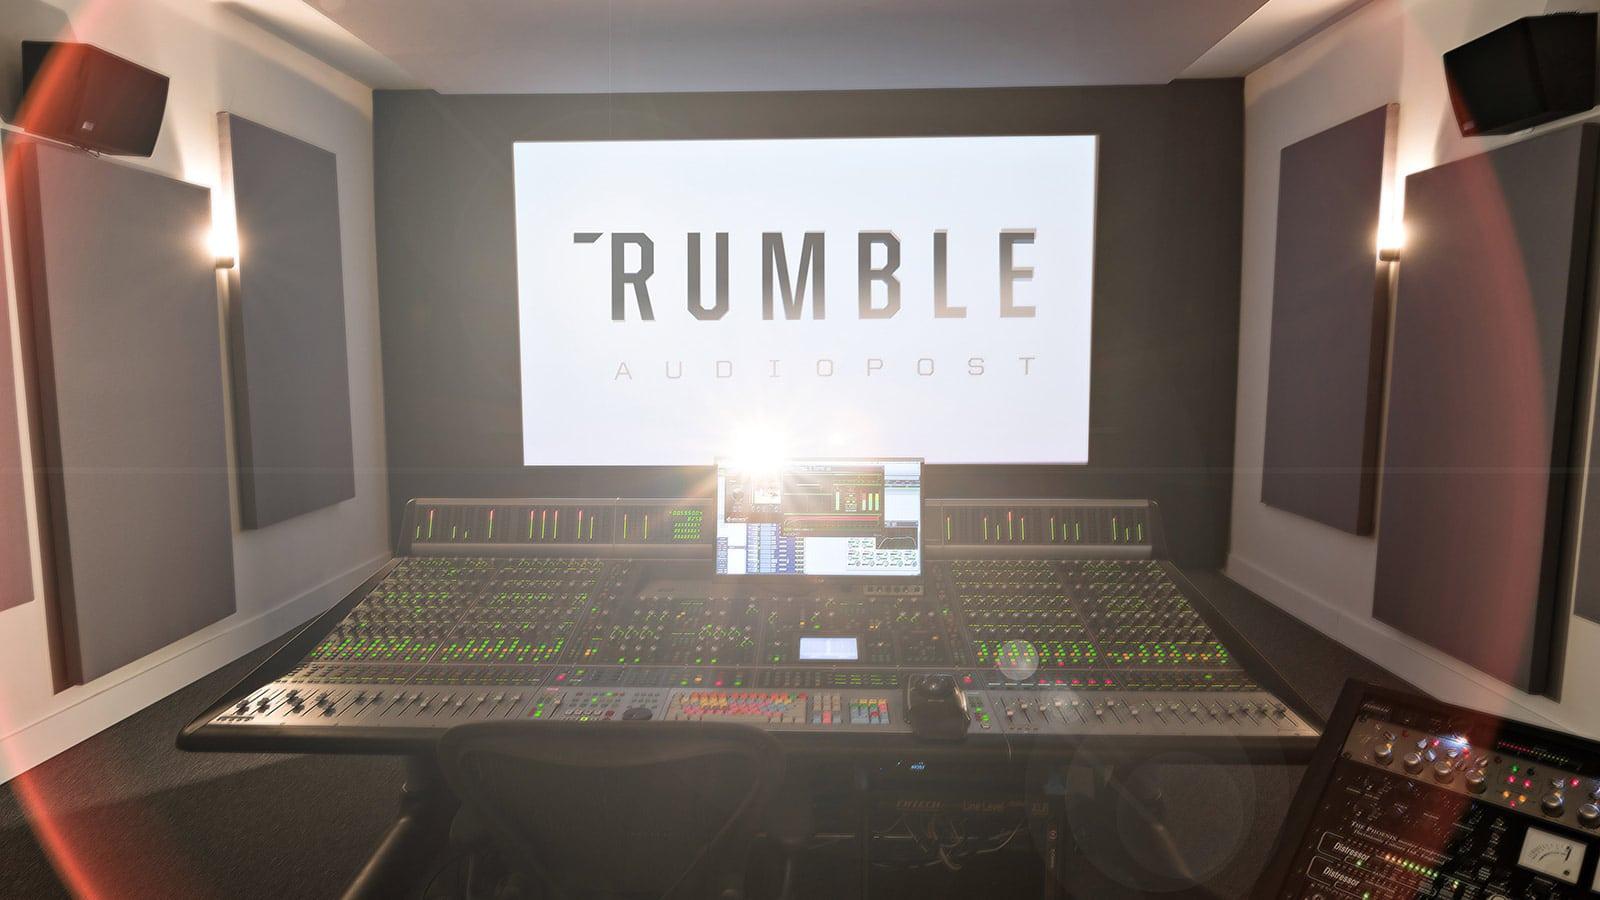 Rumble Audio Post   Meyer Sound